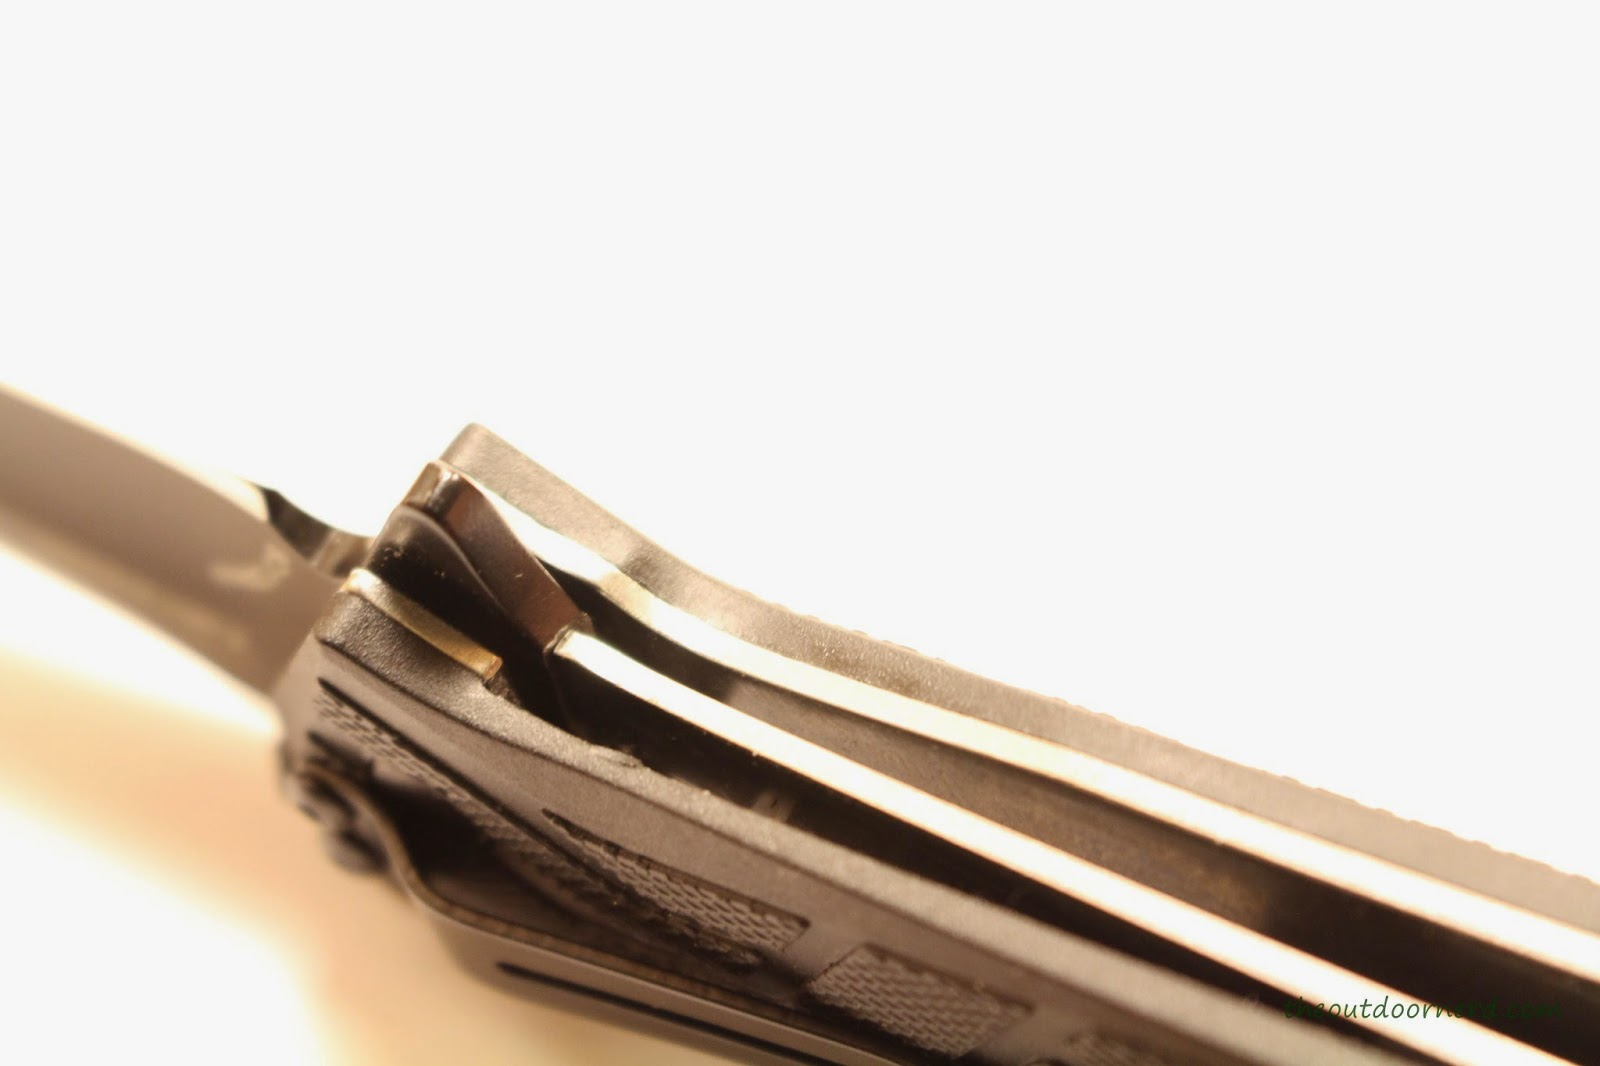 Kershaw Brawler Pocket Knife Another Closeup Of Lockup